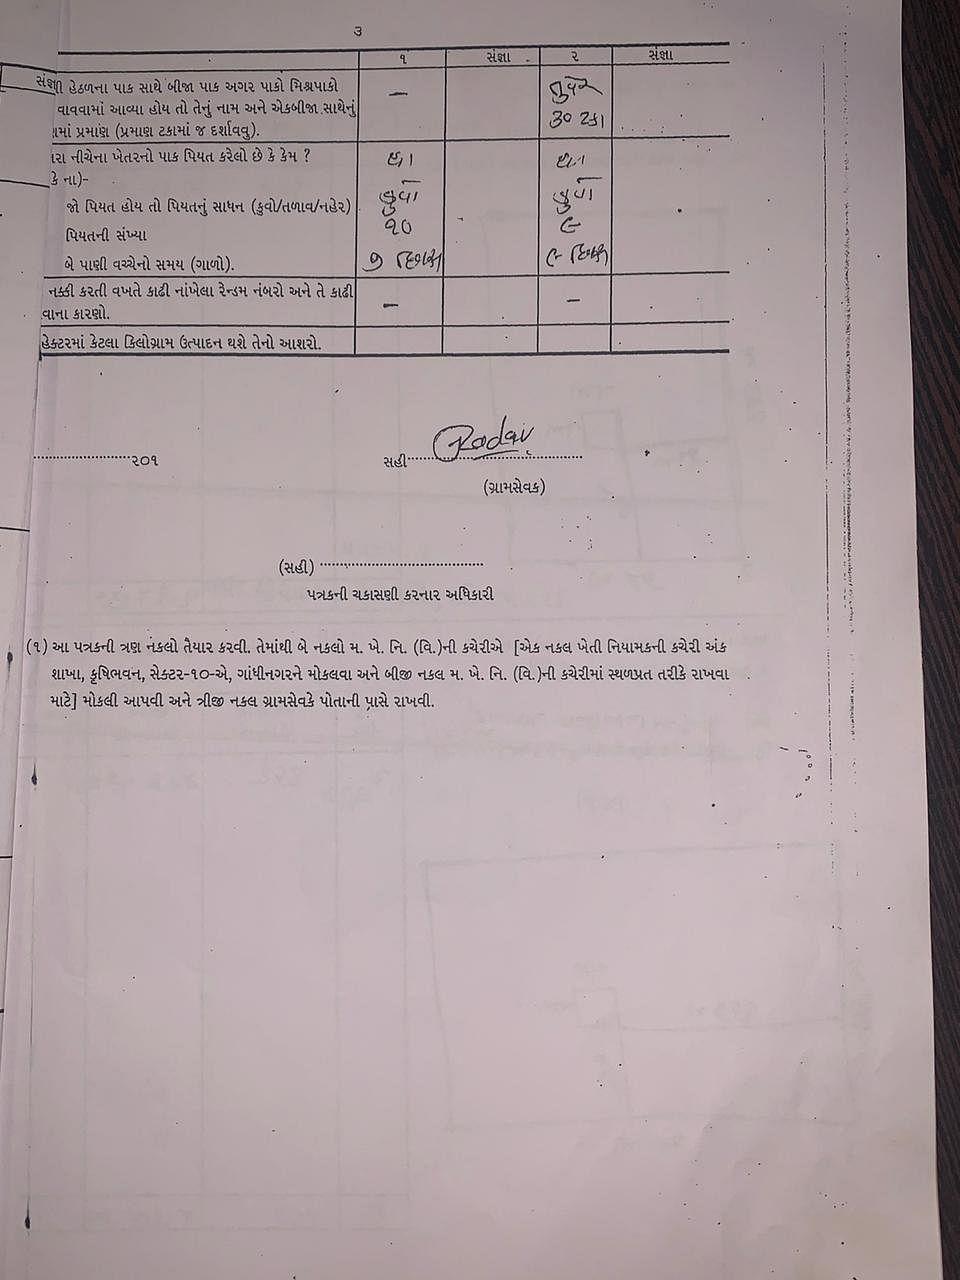 Pradhan Mantri Fasal Bima Yojana scam in Gujarat bigger than Rafale, alleges Congress